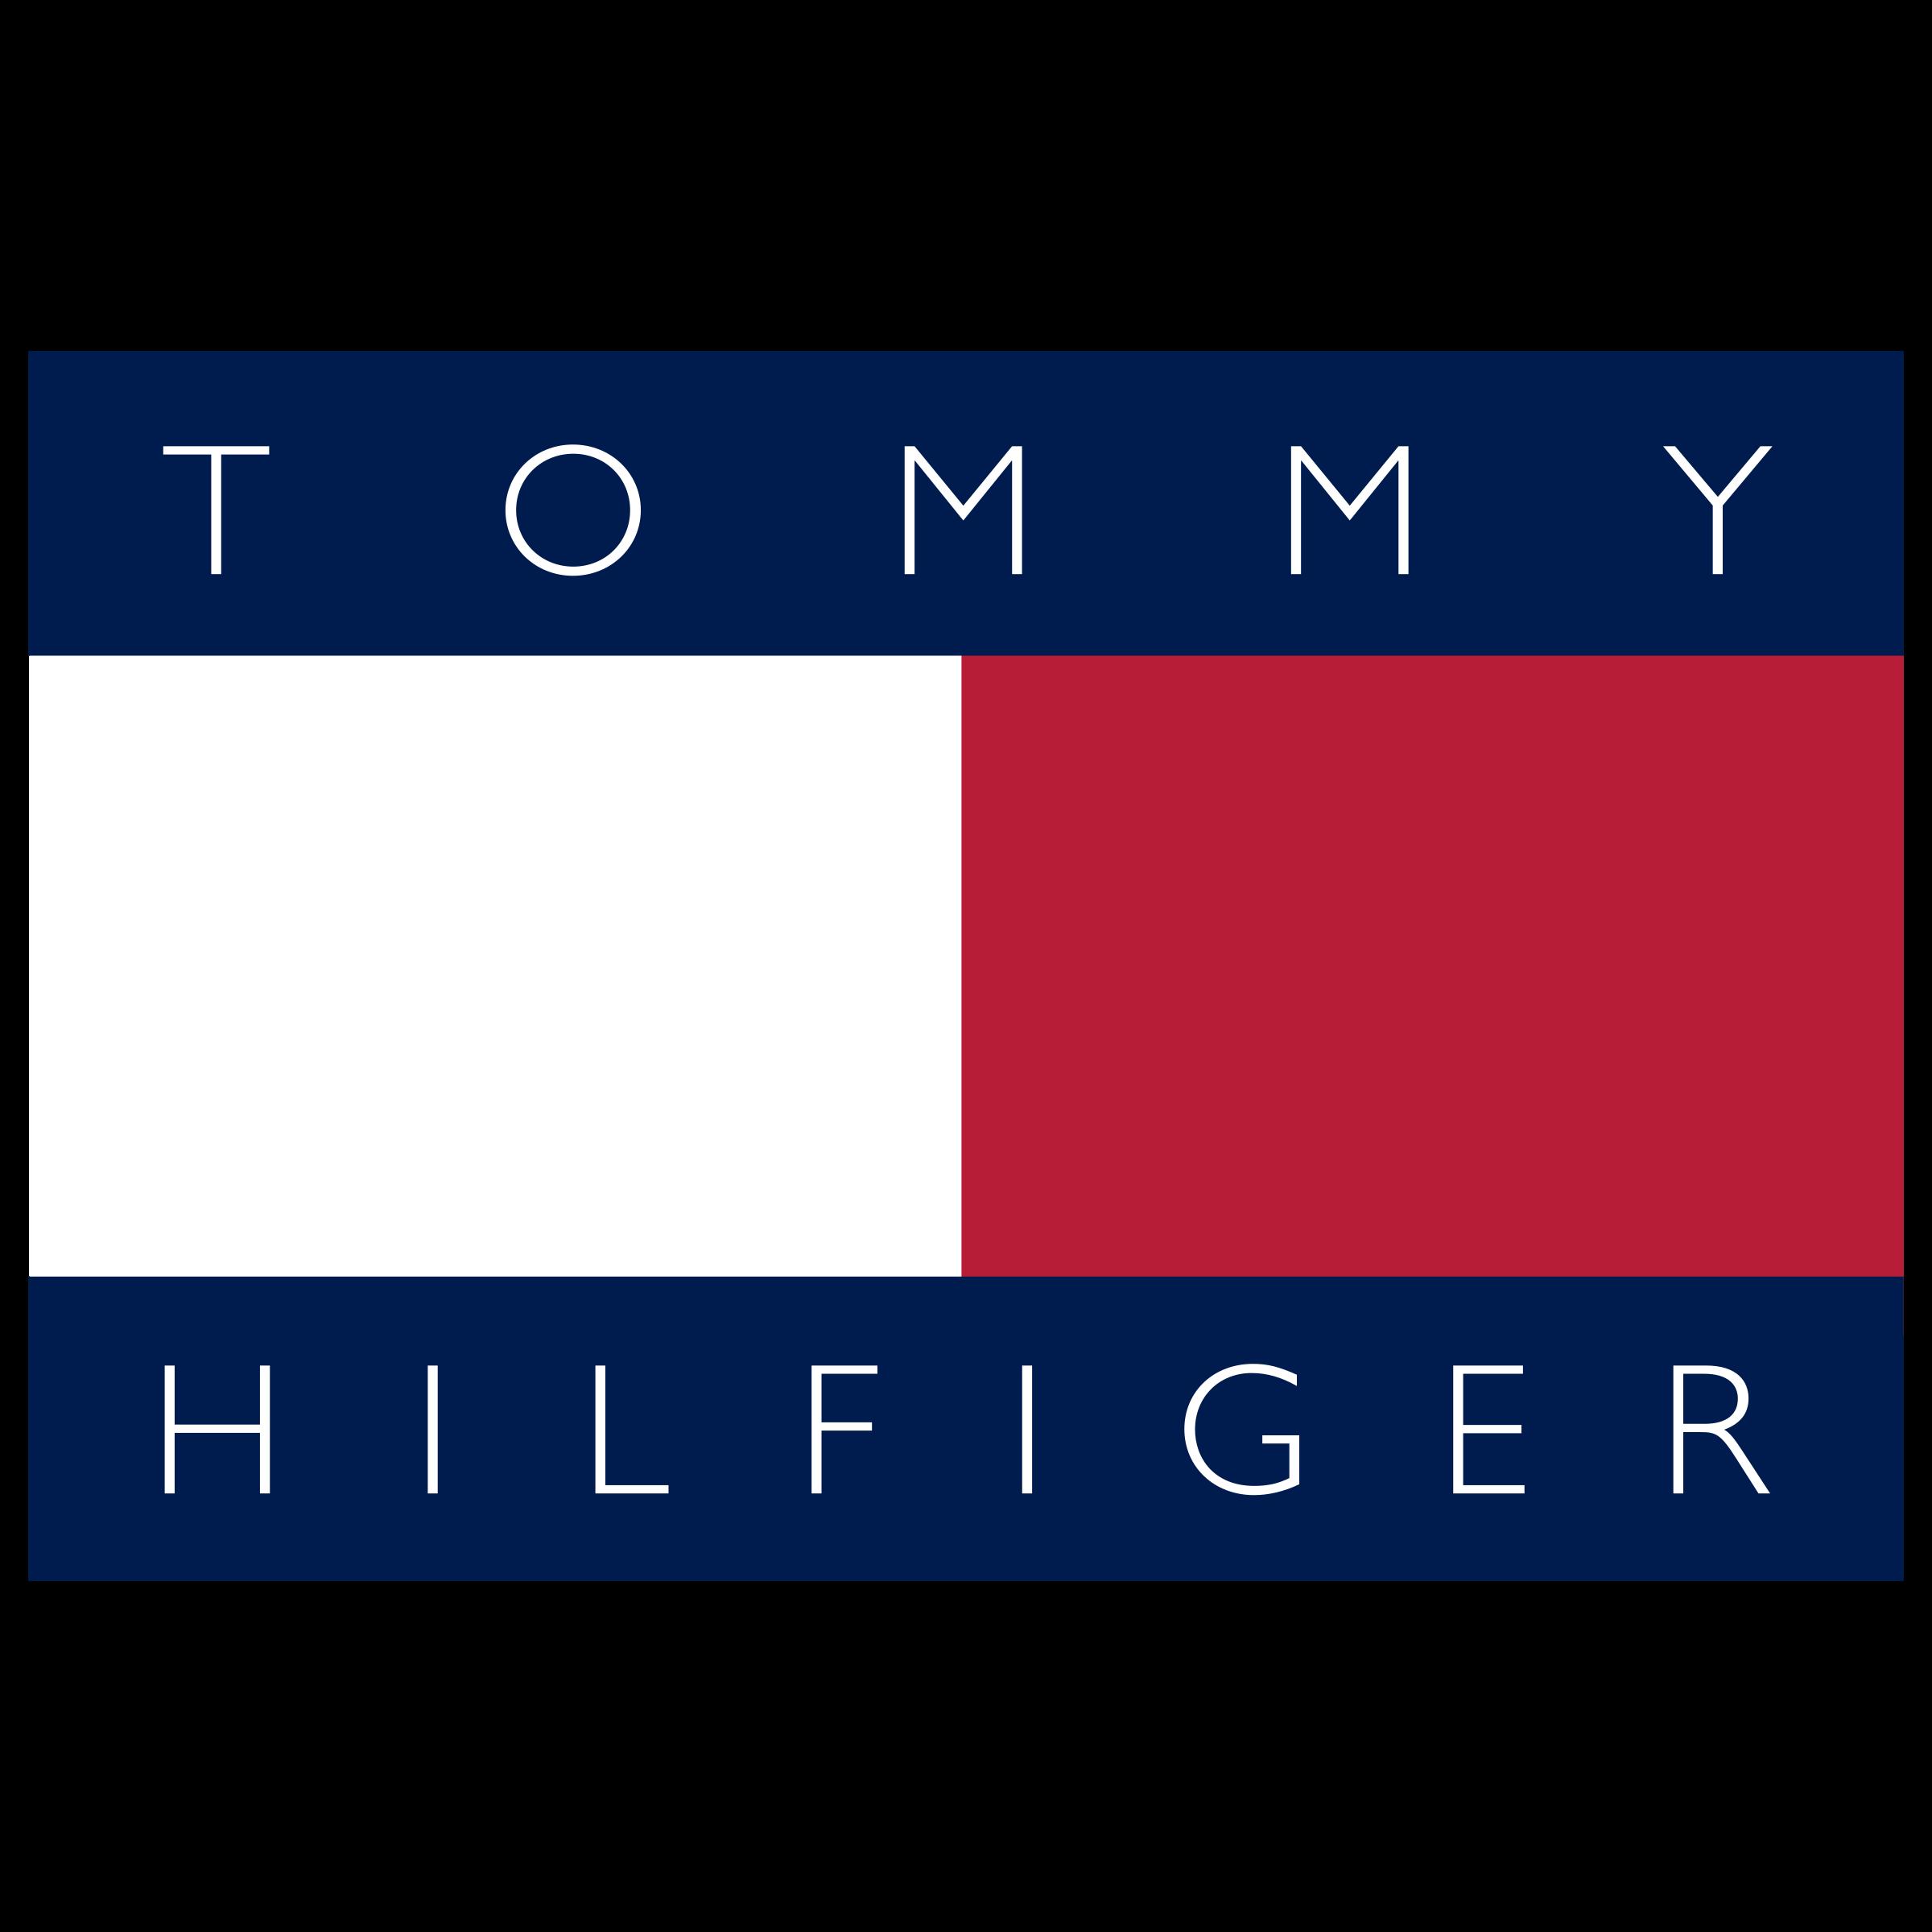 Tommy Hilfiger Grand Ajaccio Baléone